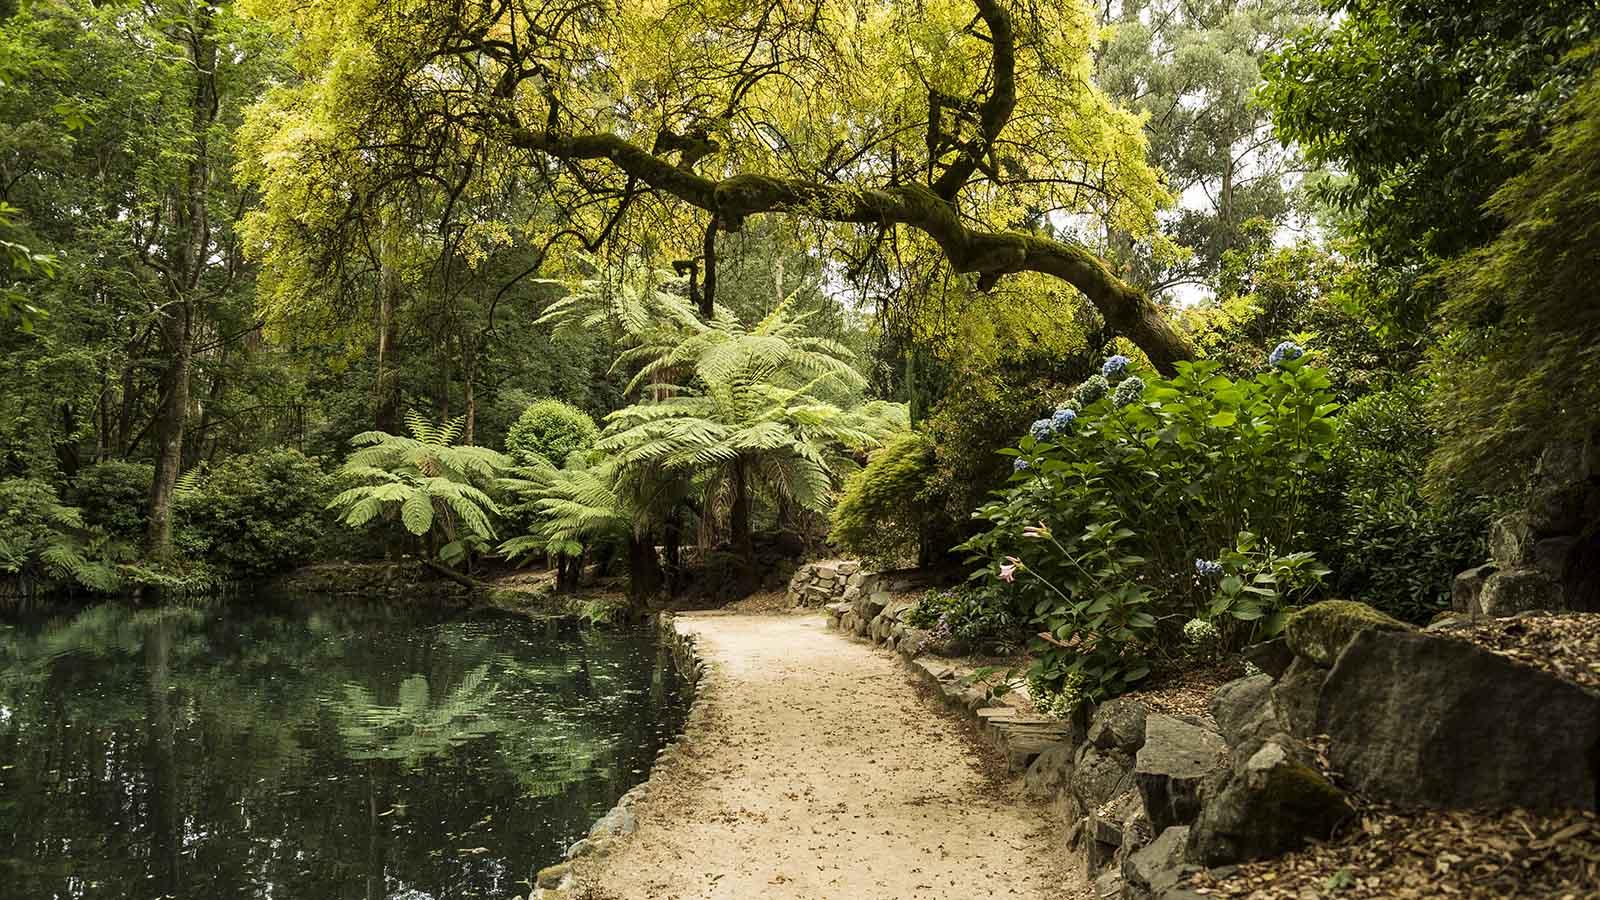 Alfred Nicholas Gardens, Yarra Valley & the Dandenong Ranges, Victoria, Australia